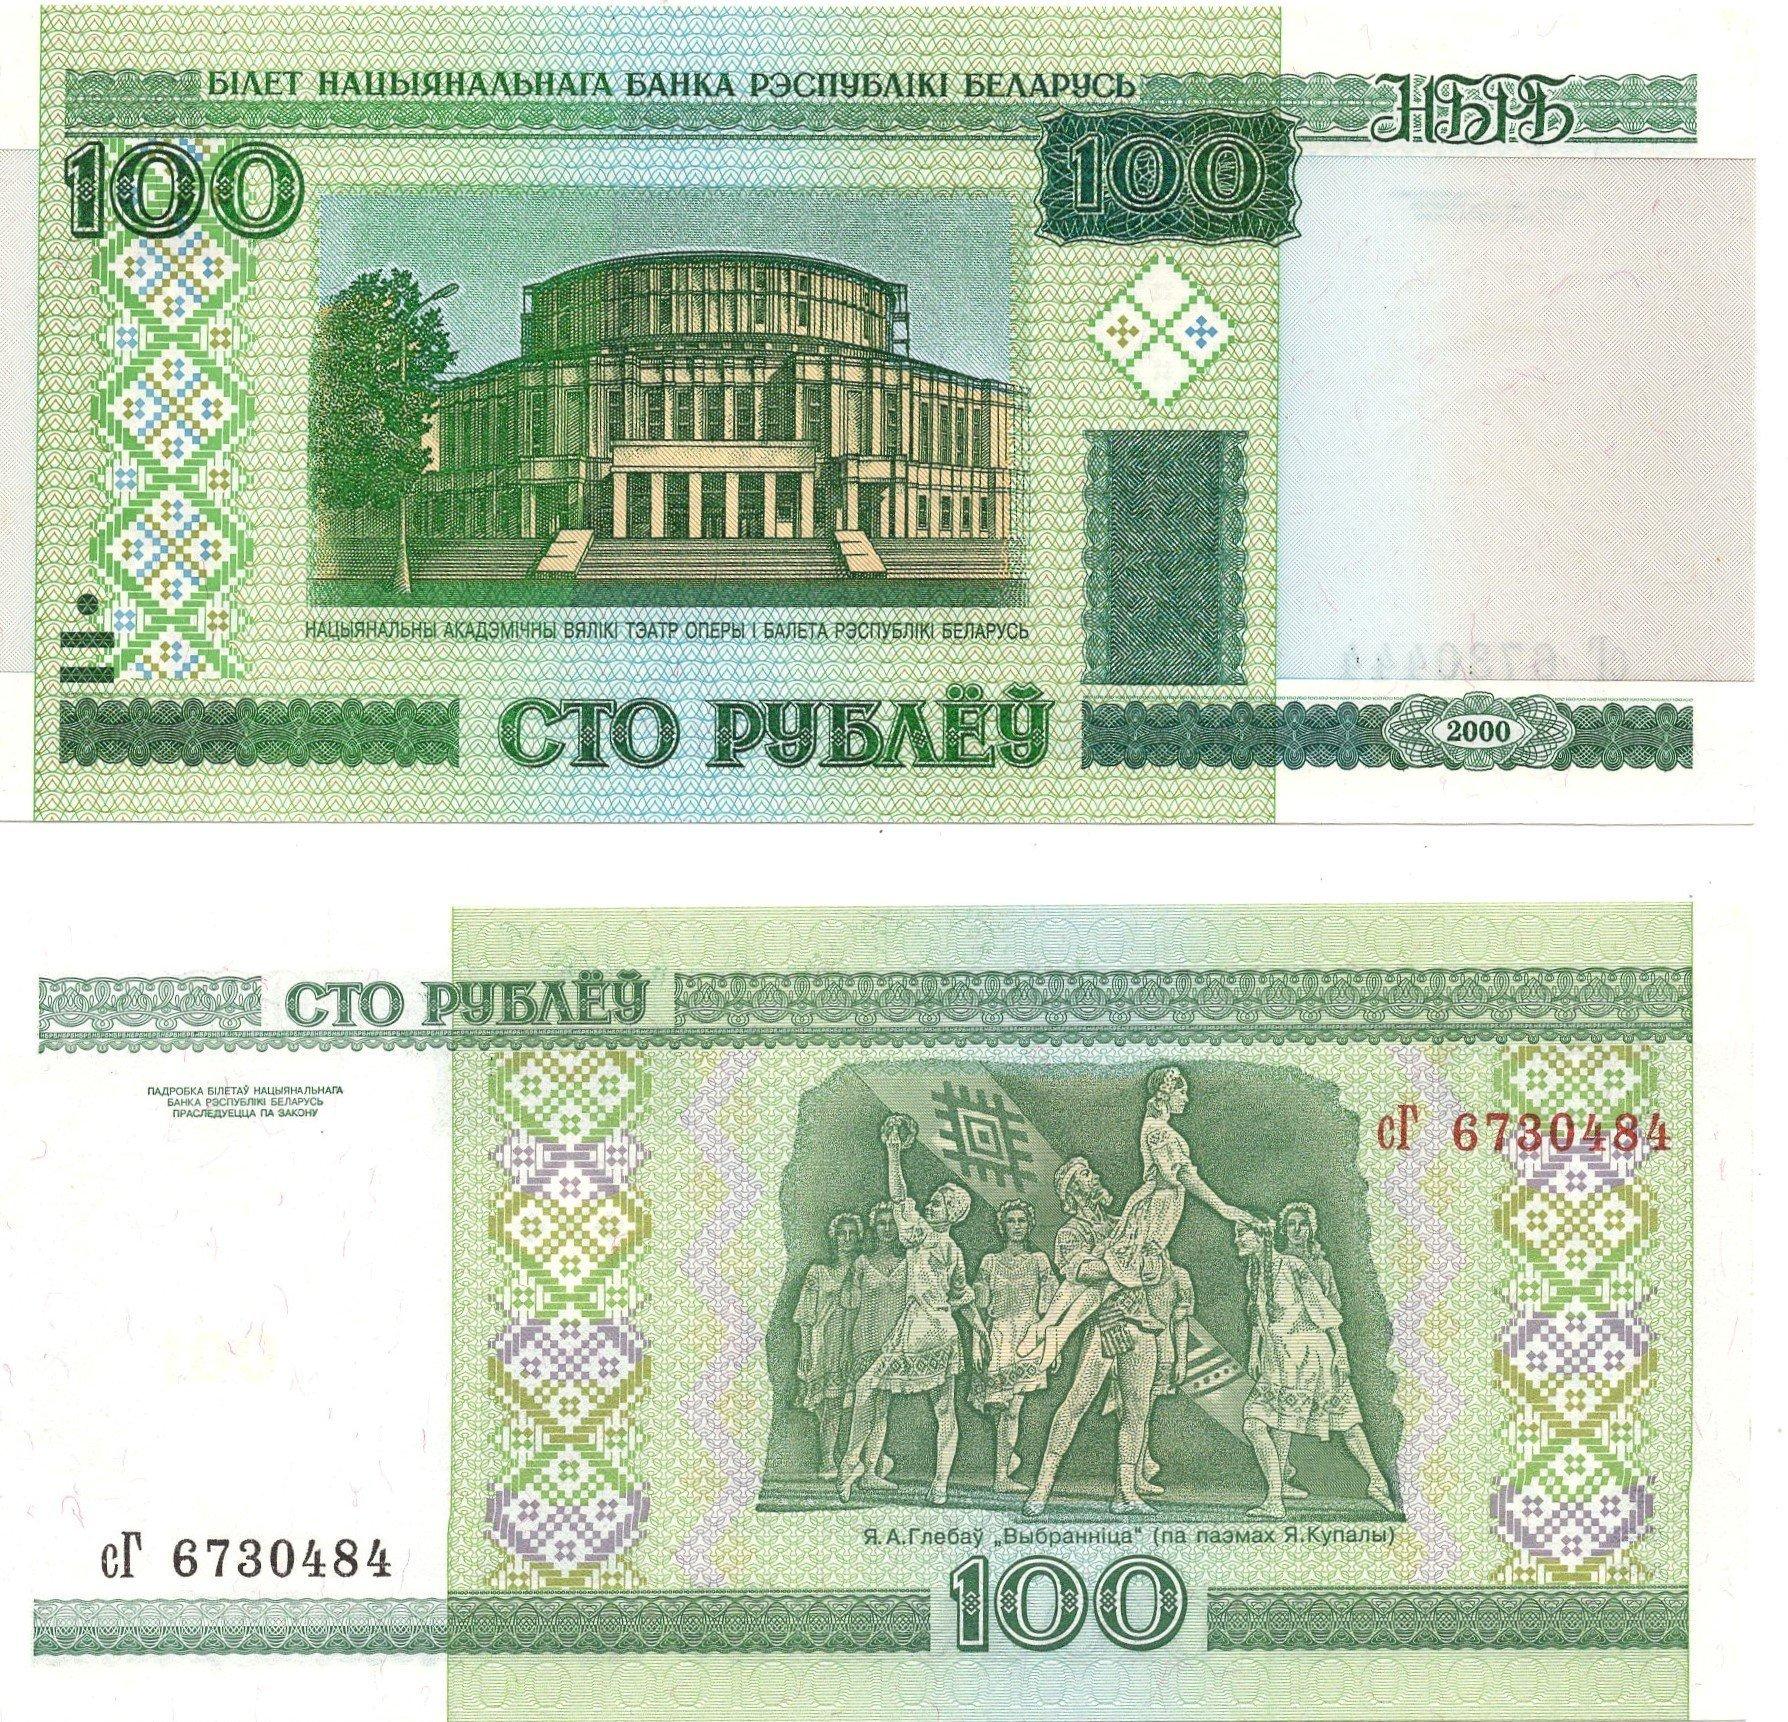 belarus 100 roubles 2000